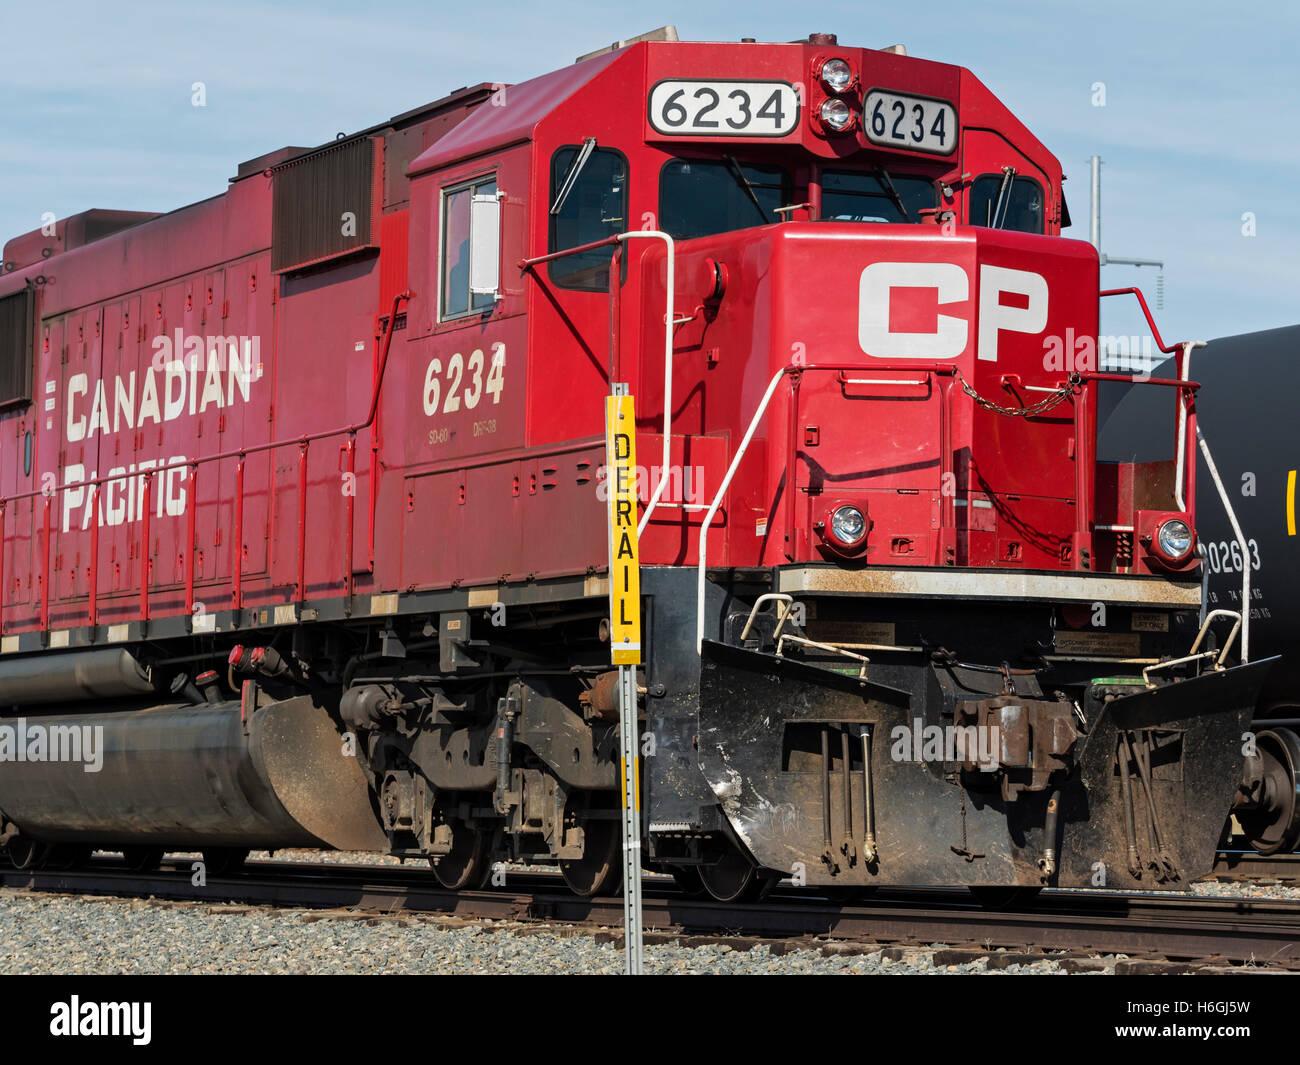 Canadian Pacific Railway locomotives, Medicine Hat, Alberta, Canada - Stock Image